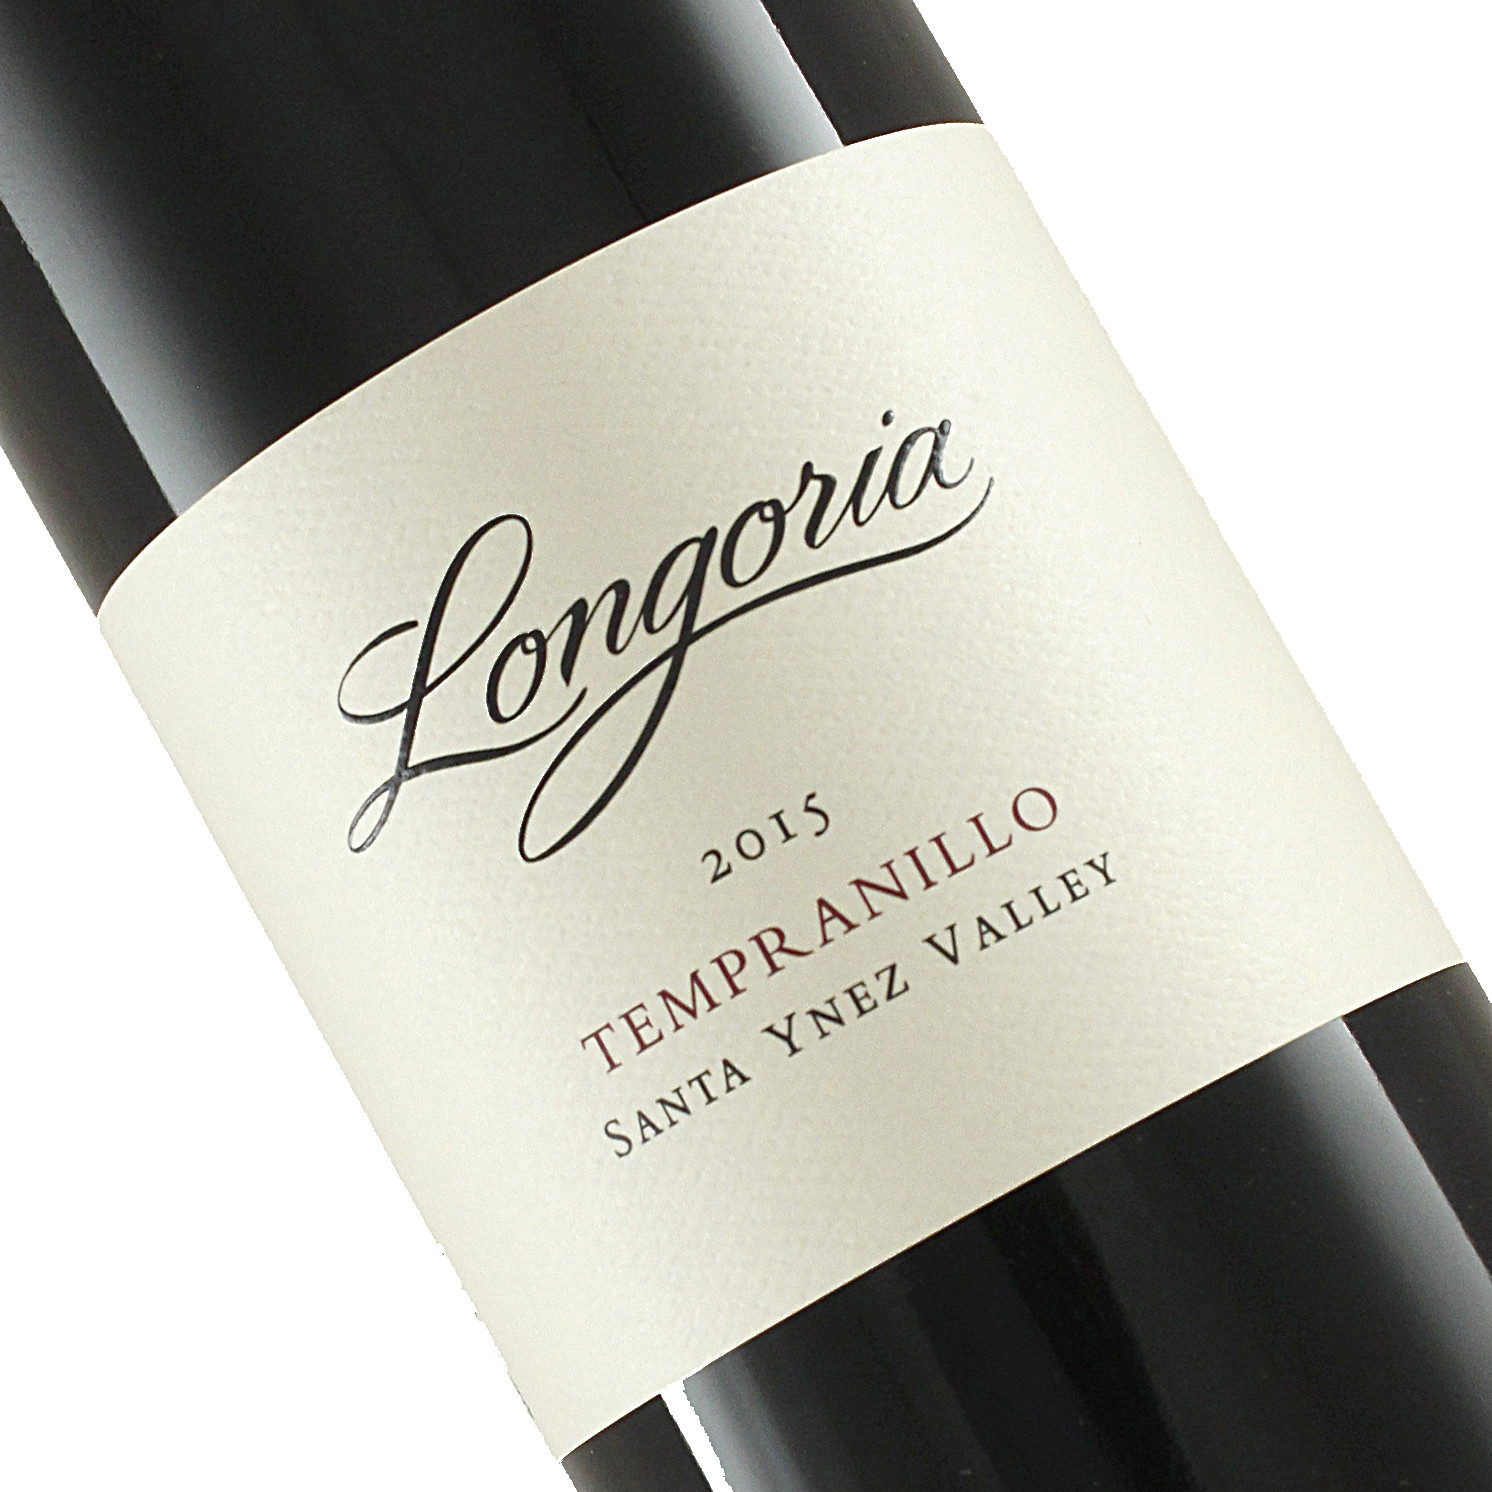 Longoria 2015 Tempranillo Santa Ynez Valley